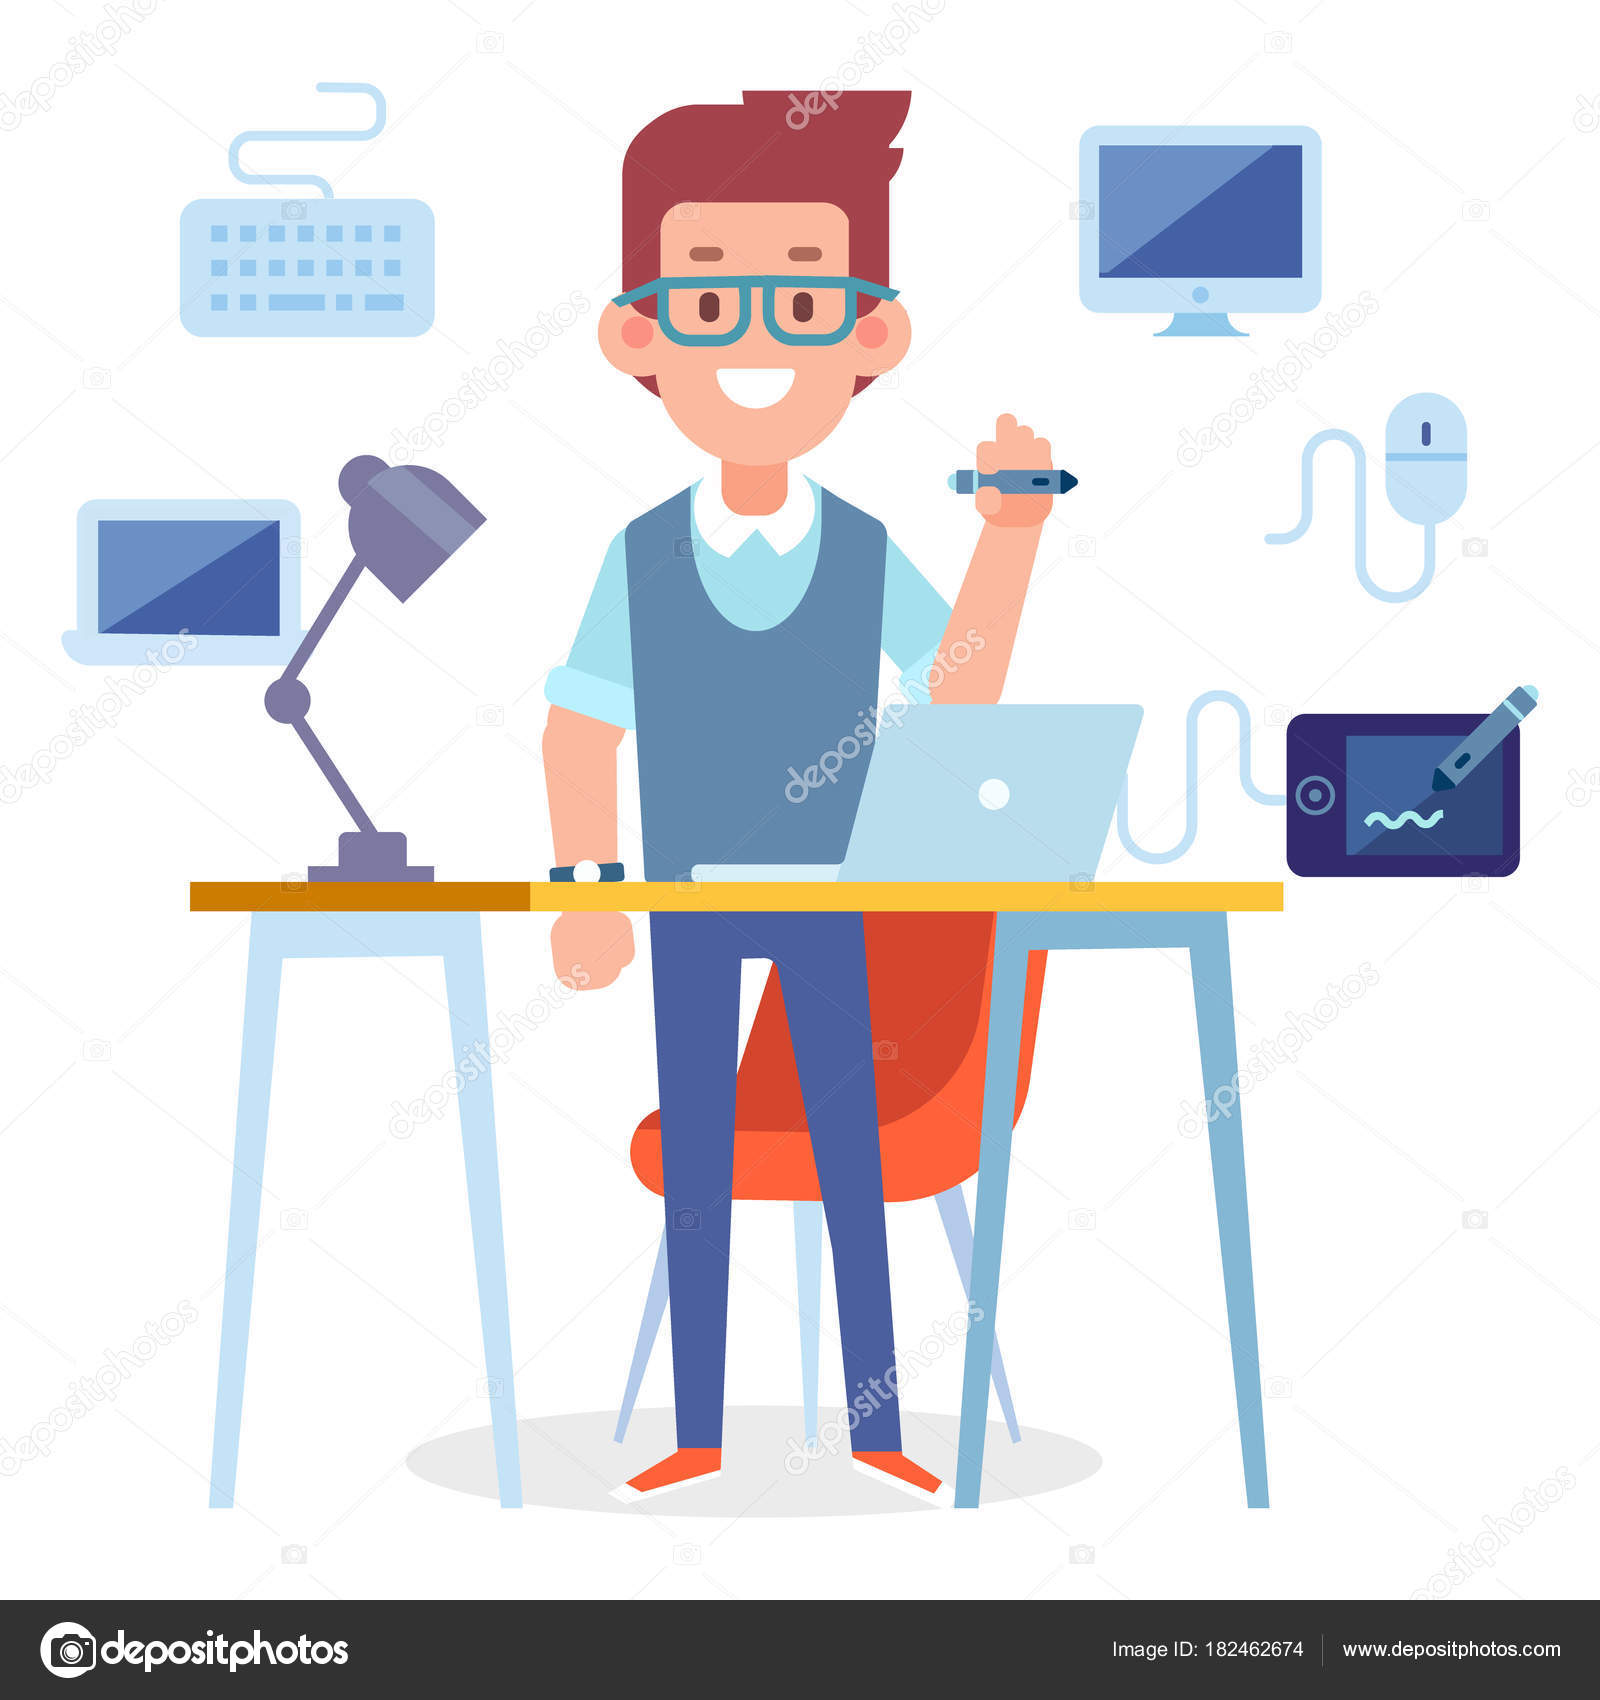 Designer Vector Character Cartoon Style Flat Illustration Stock Vector C Oksana L 182462674